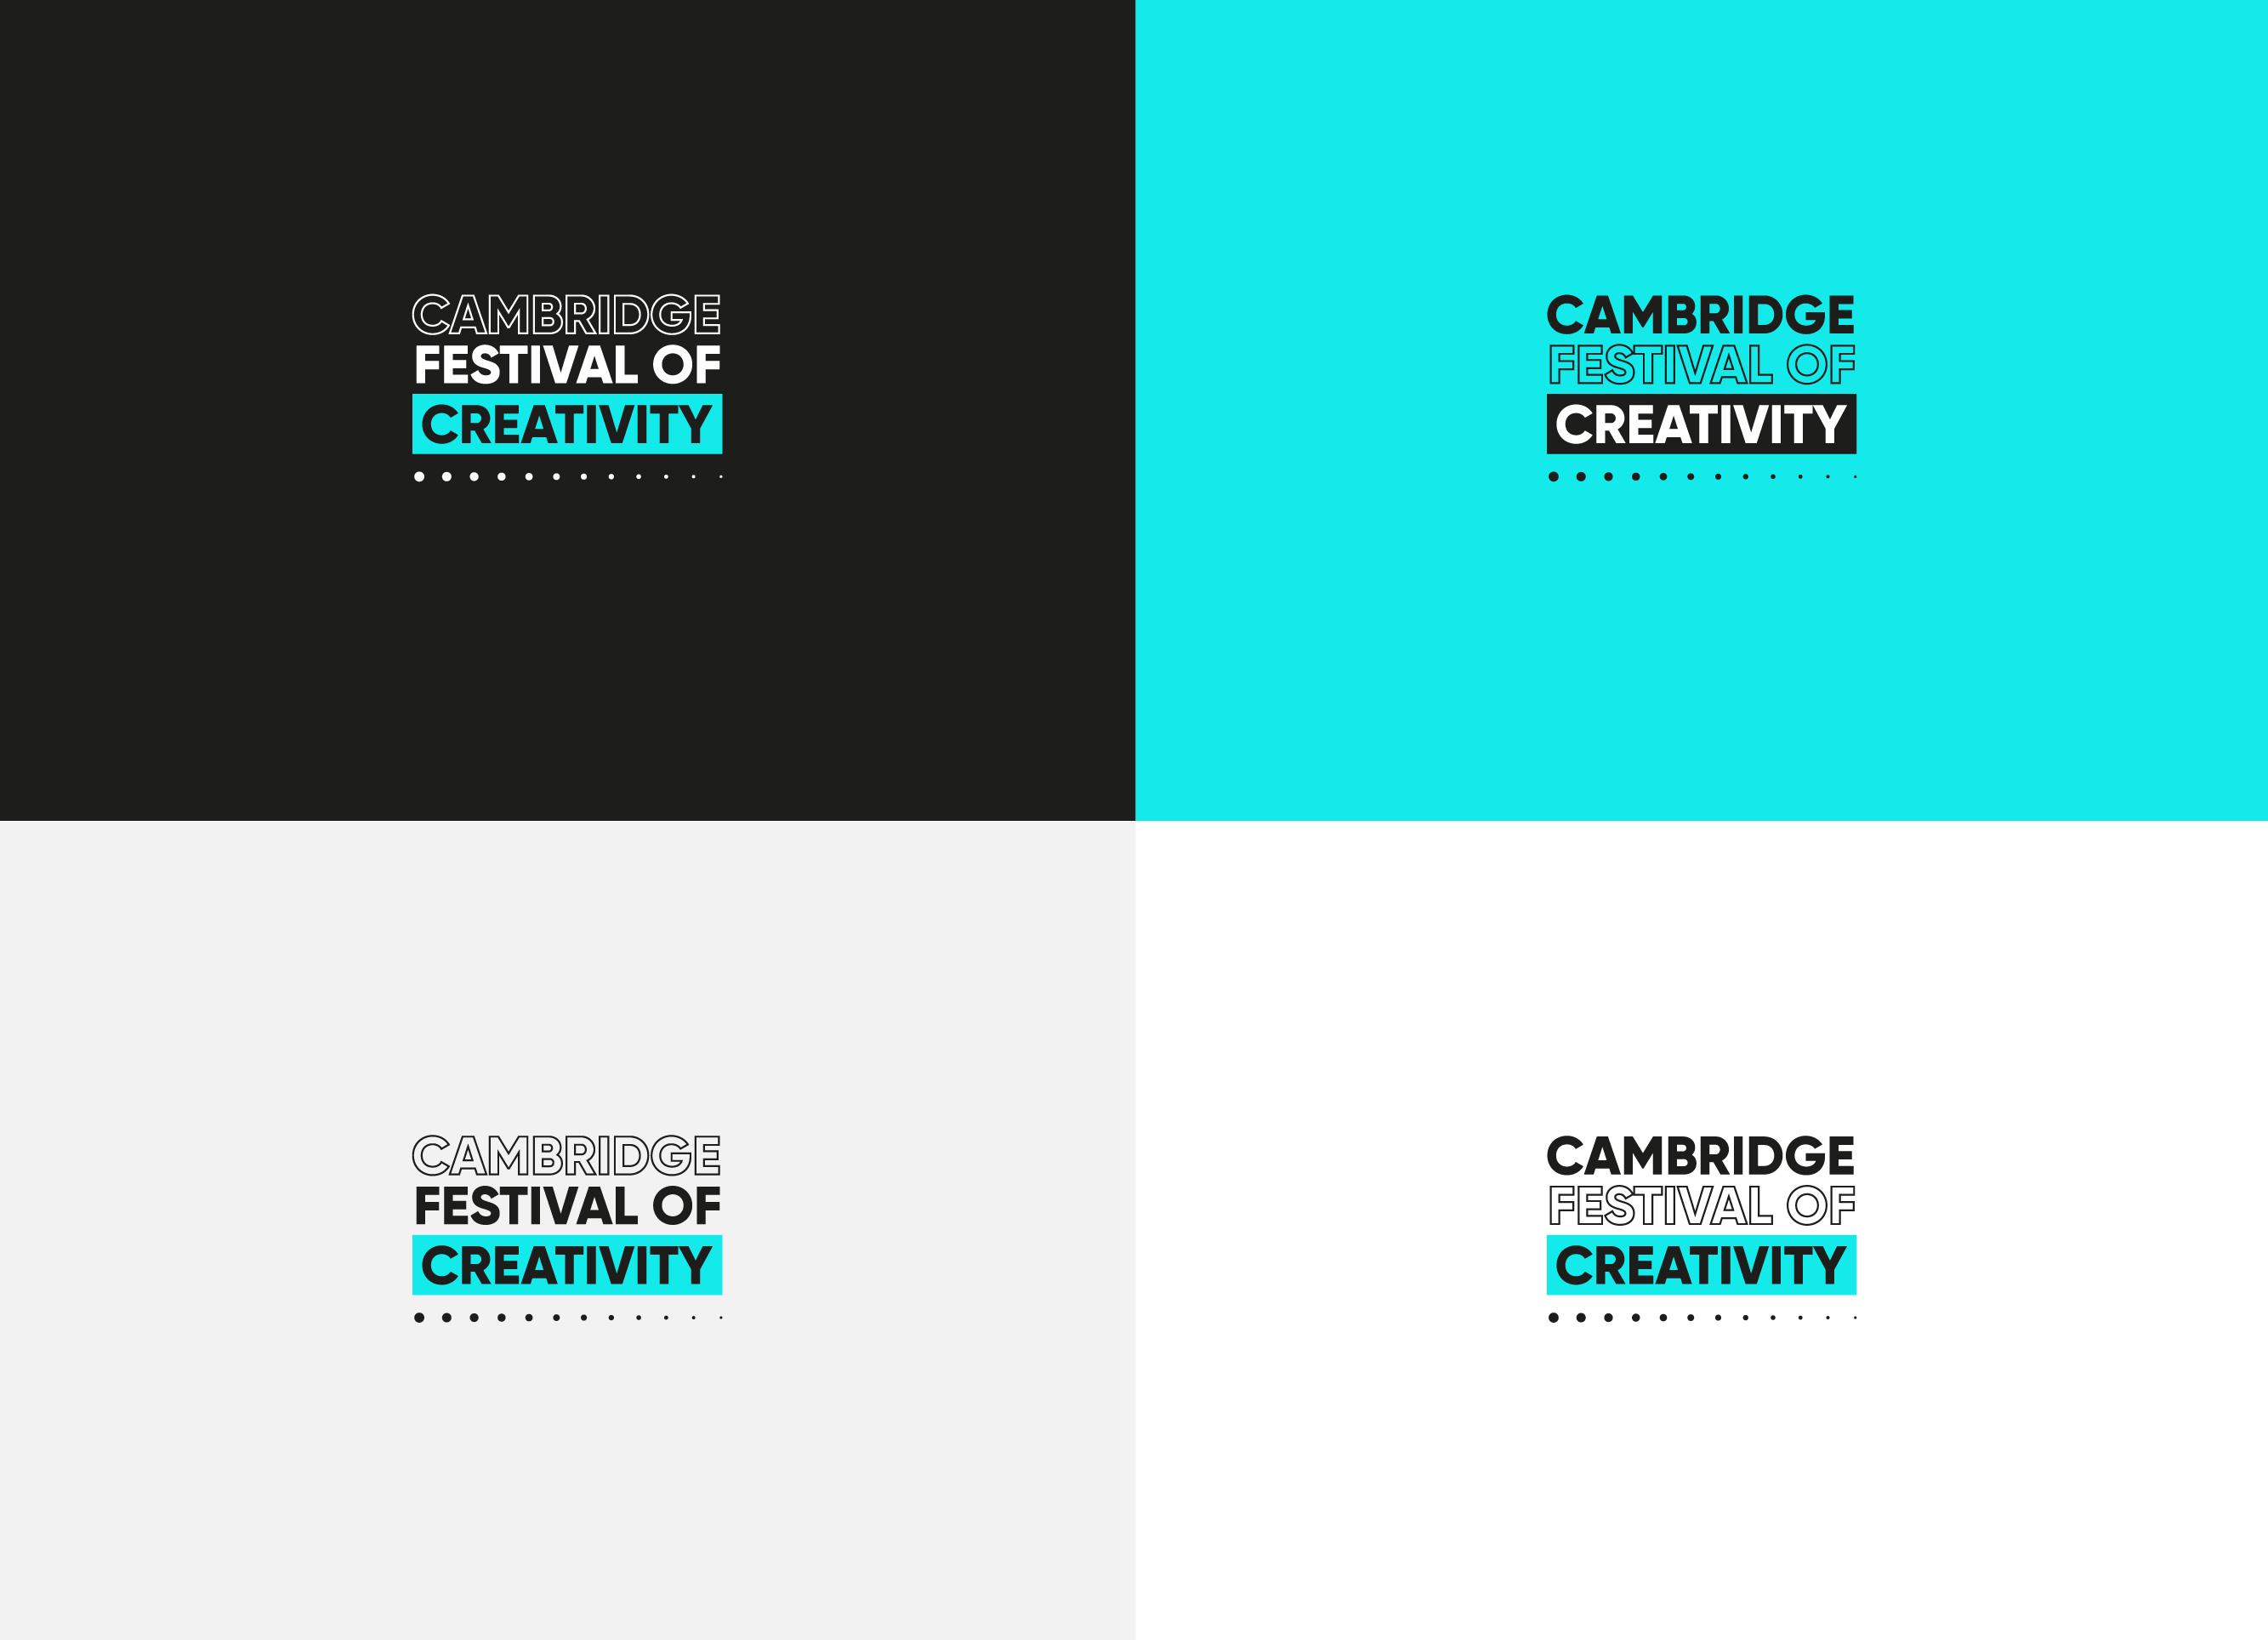 Cambridge Festival of Creativity Logos